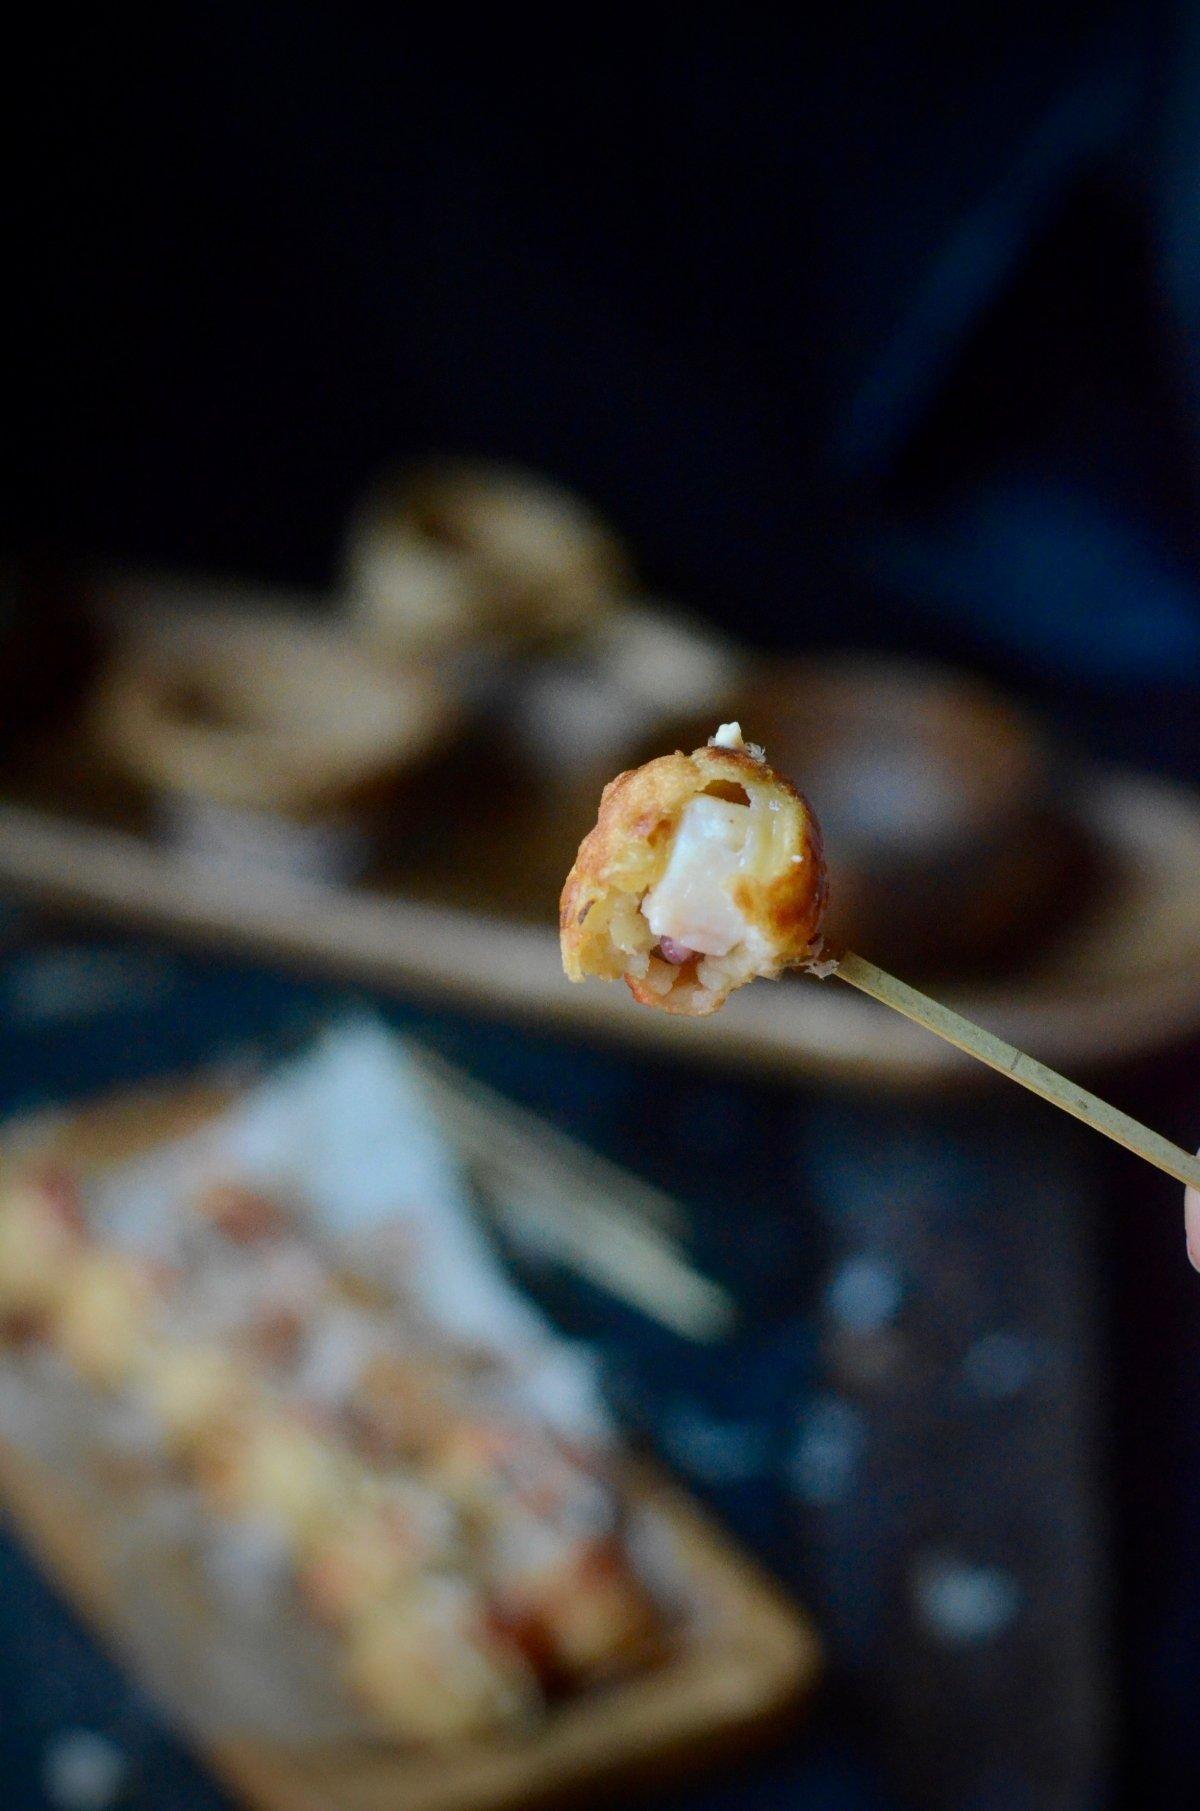 Interior jugoso de un takoyaki